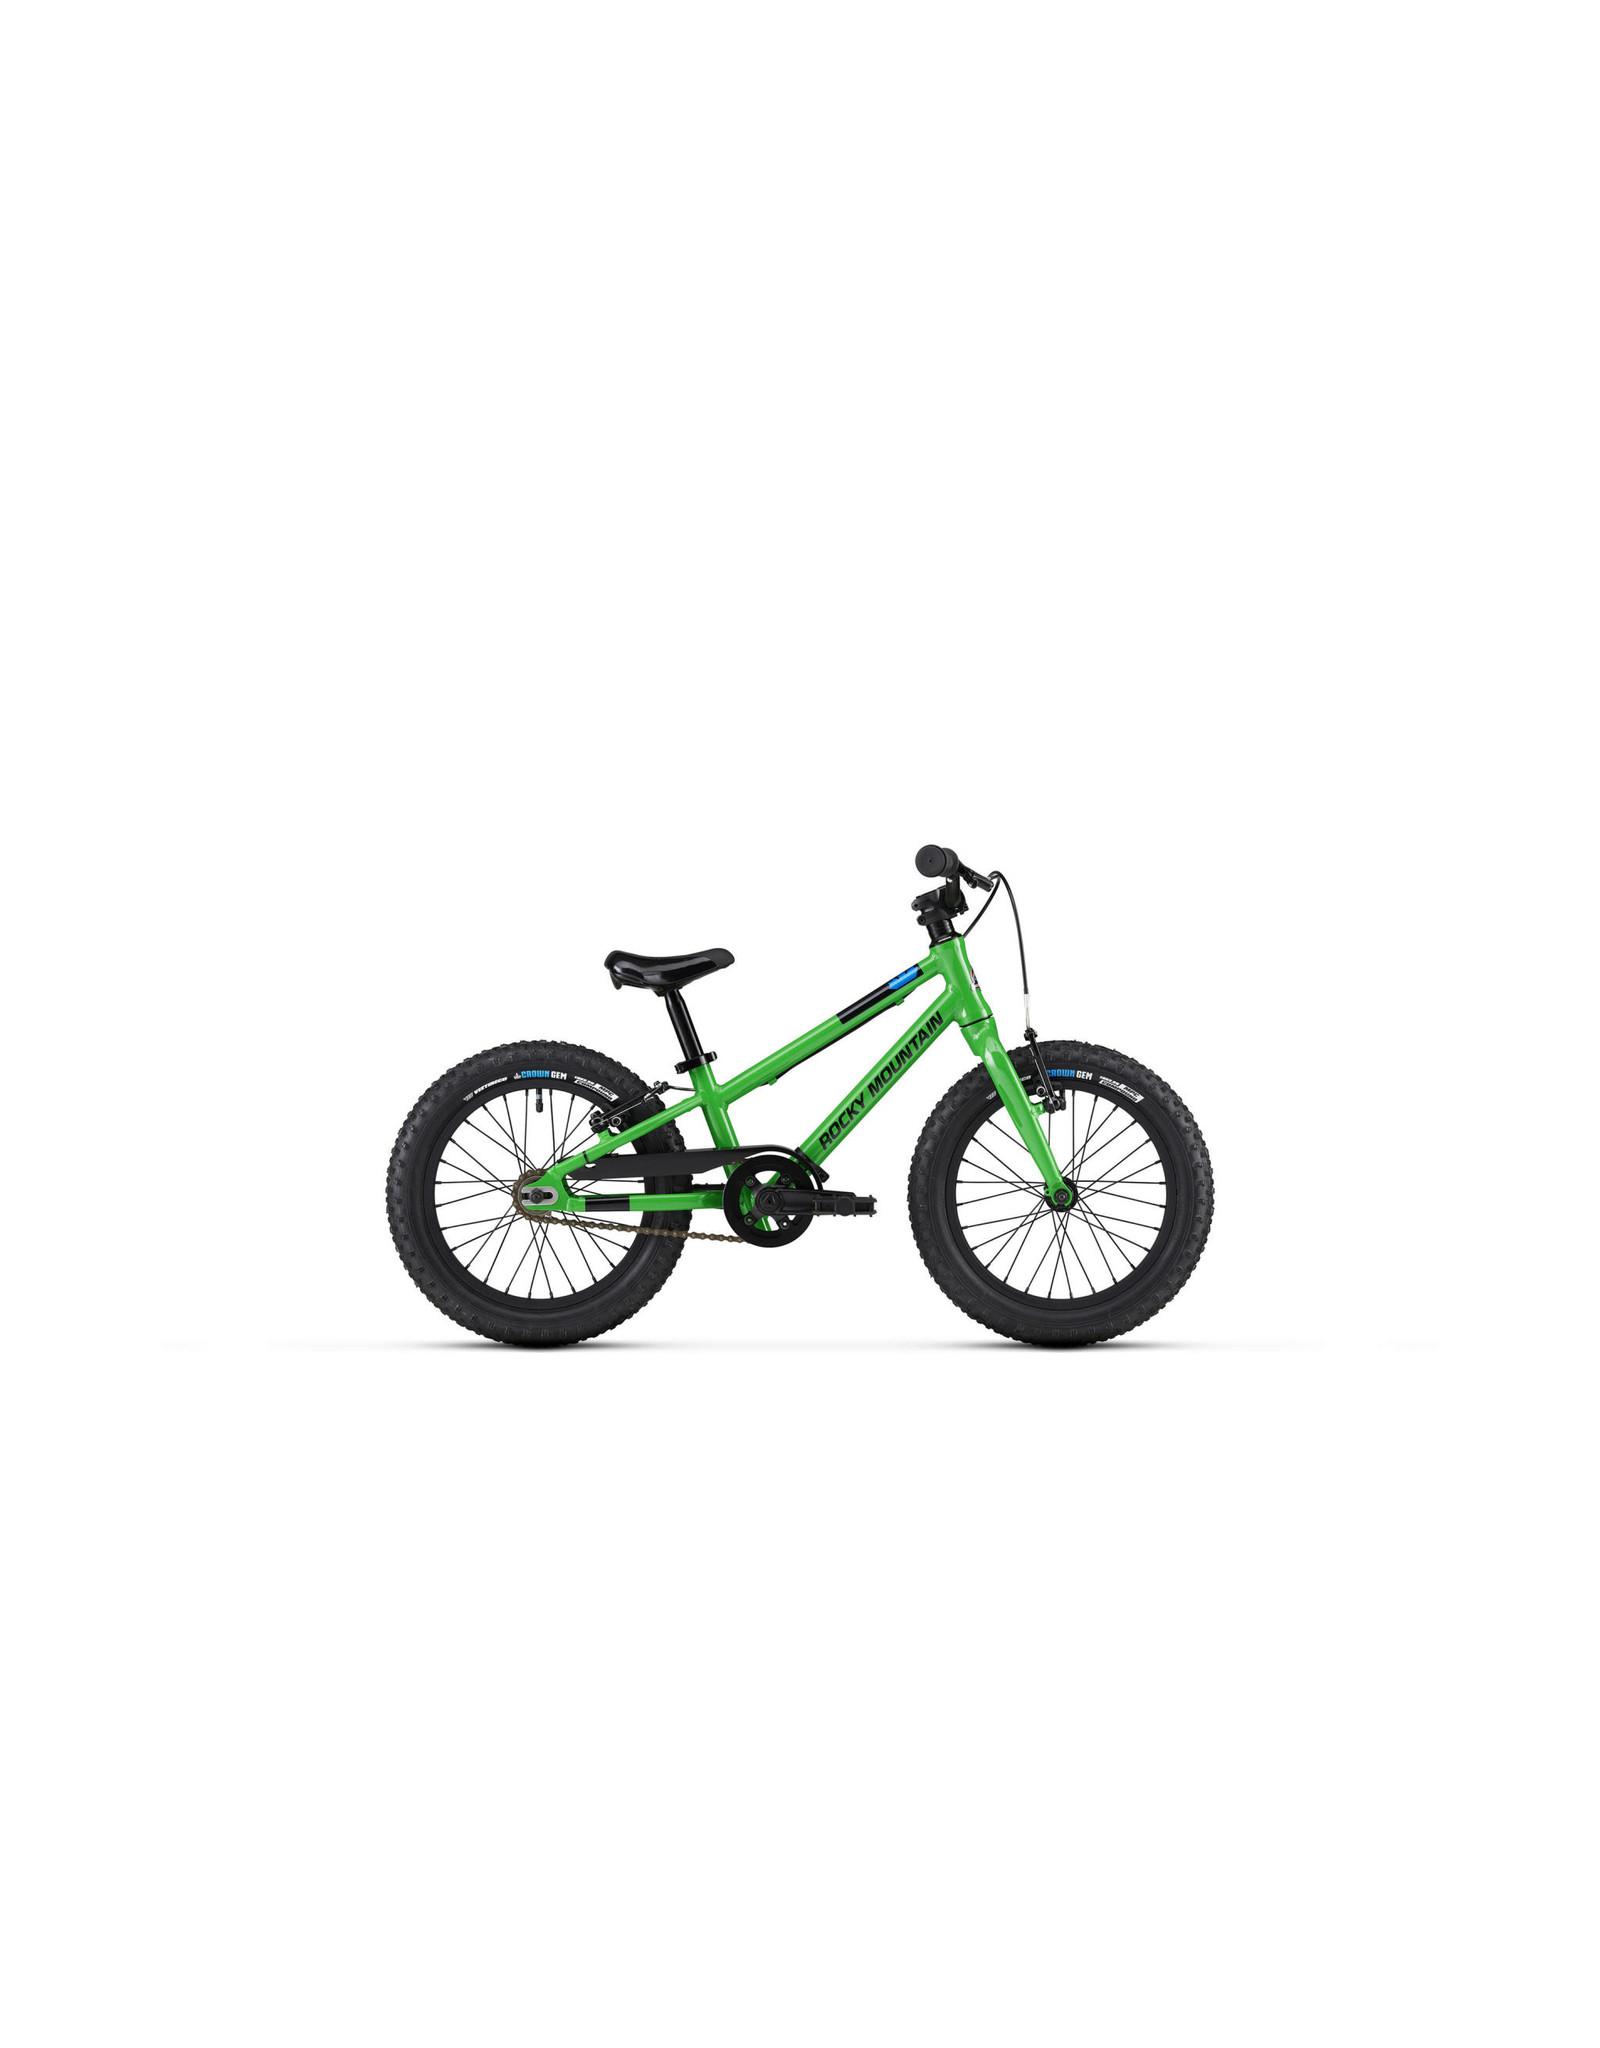 "ROCKY MOUNTAIN 2021 Rocky Mountain Edge Jr 16""  - Green/Black"